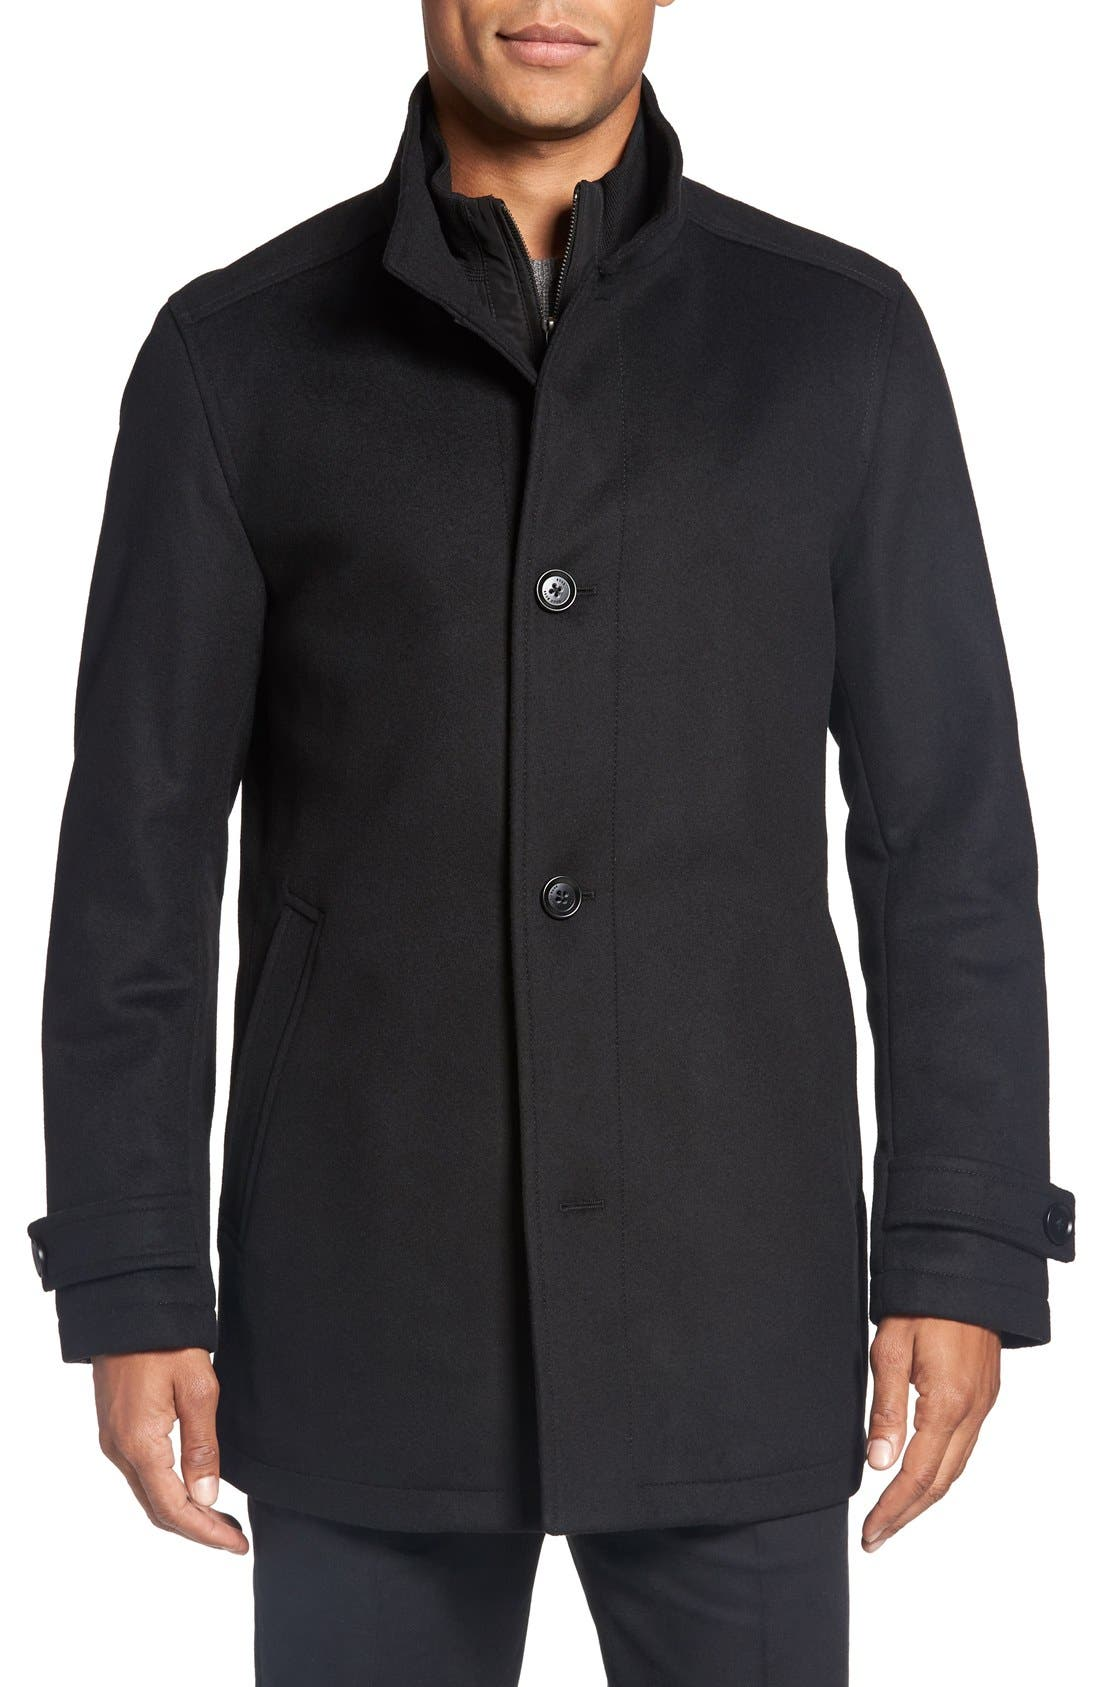 BOSS 'Camlow' Wool & Cashmere Car Coat, Main, color, 001